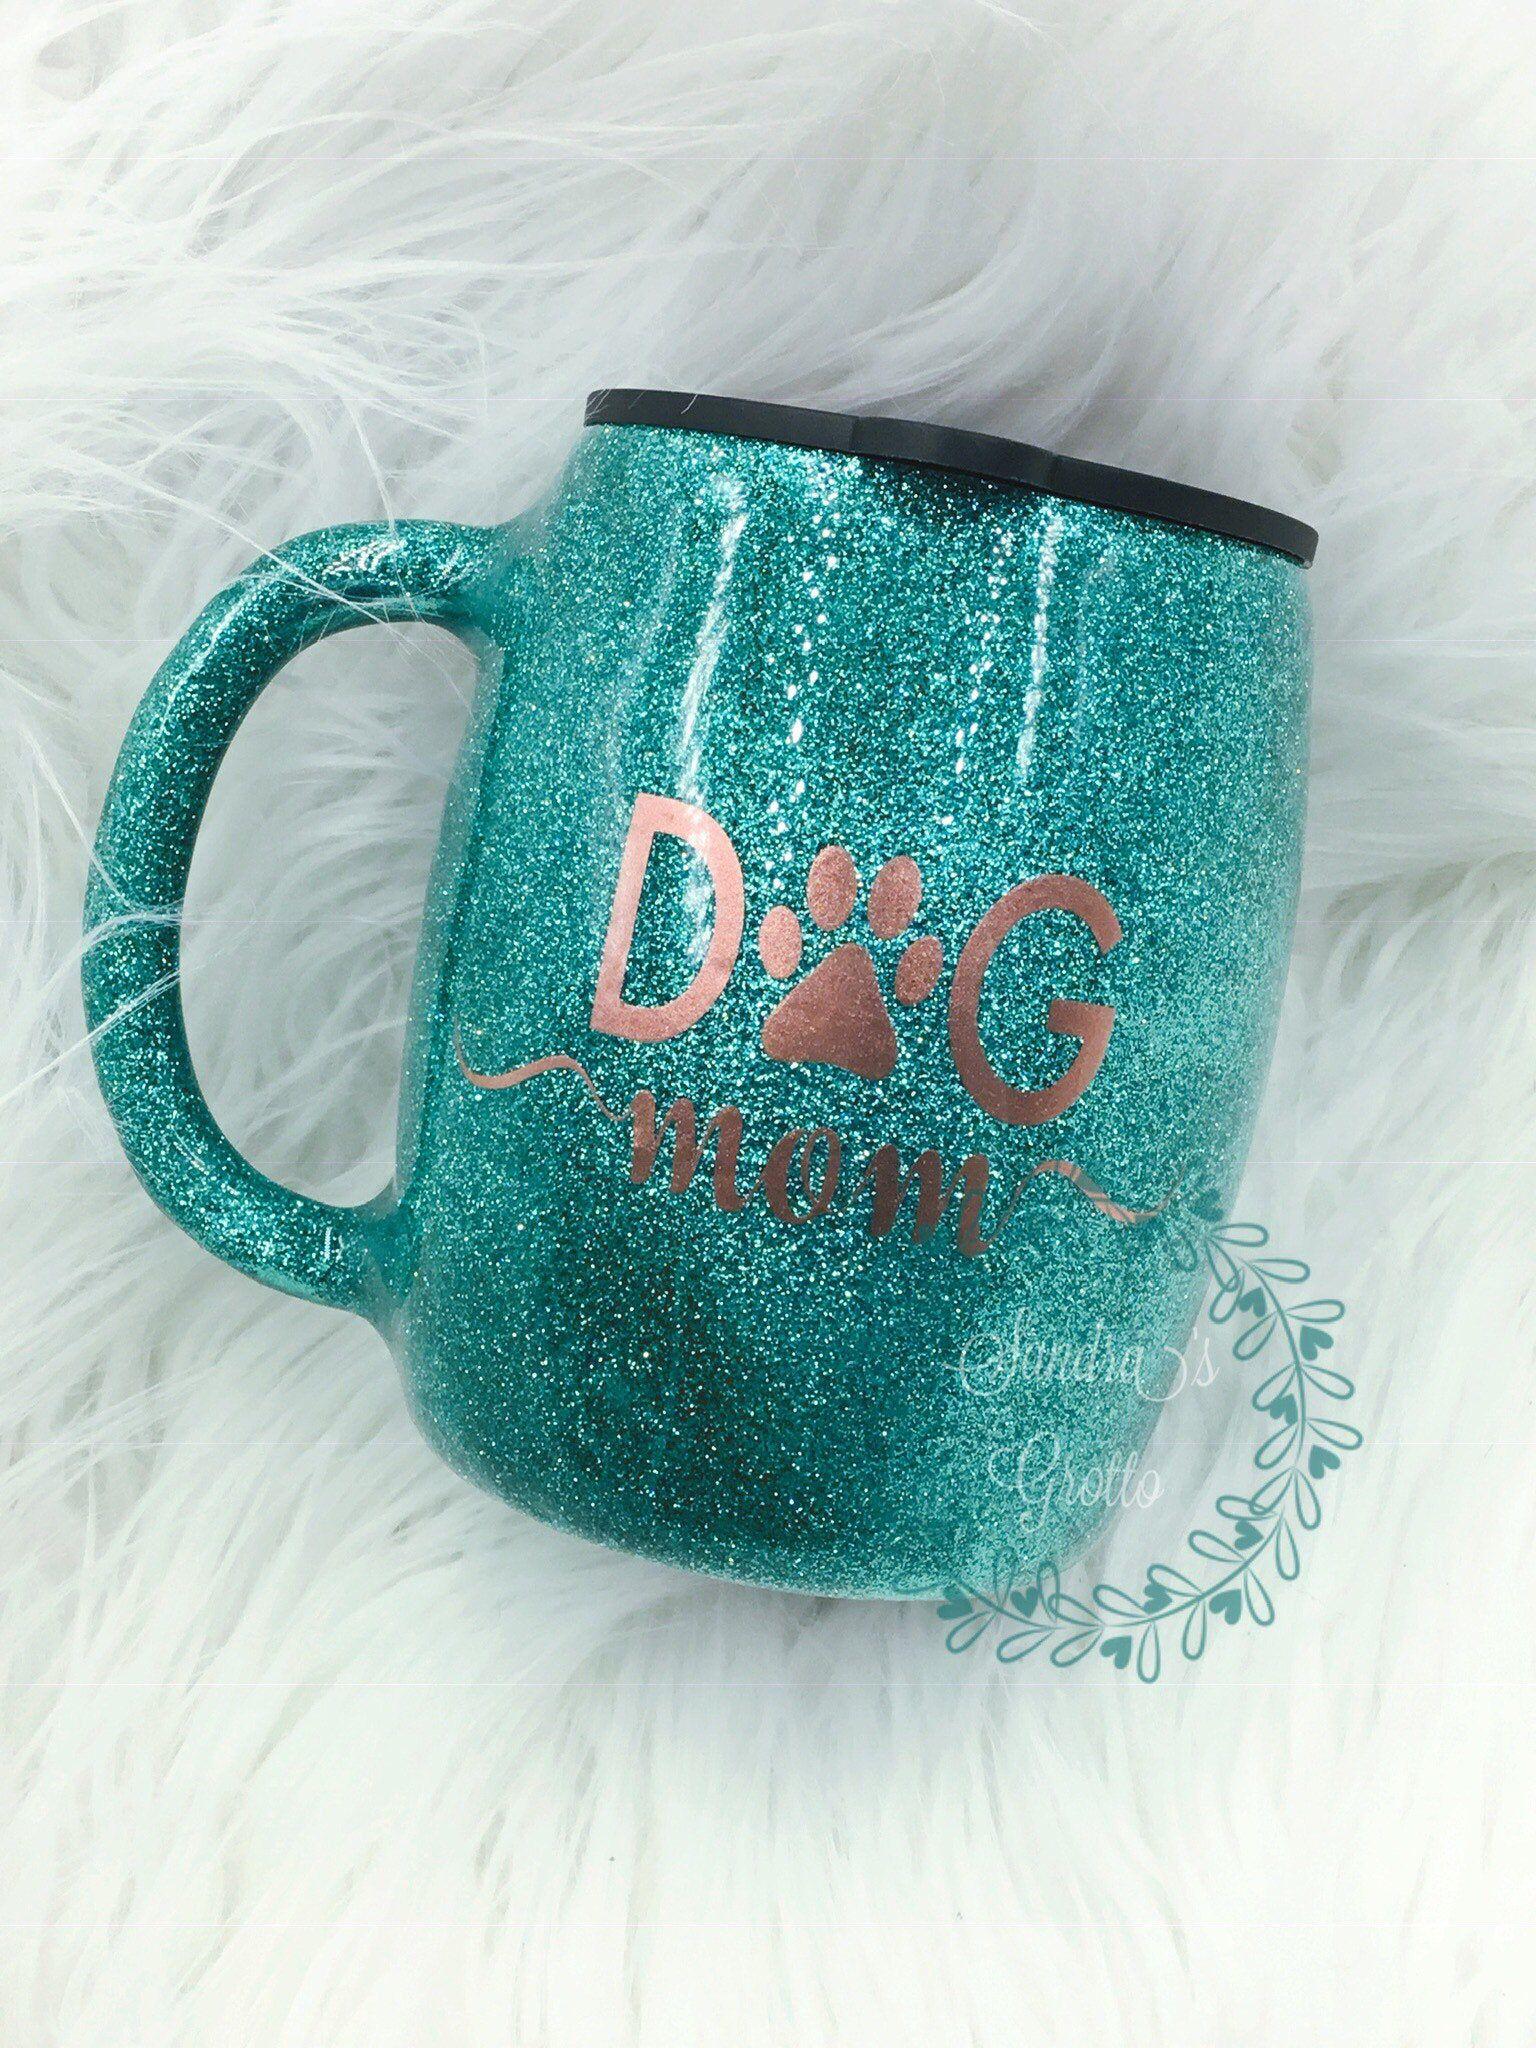 Dog mom hogg stainless steel coffee mug stainless steel